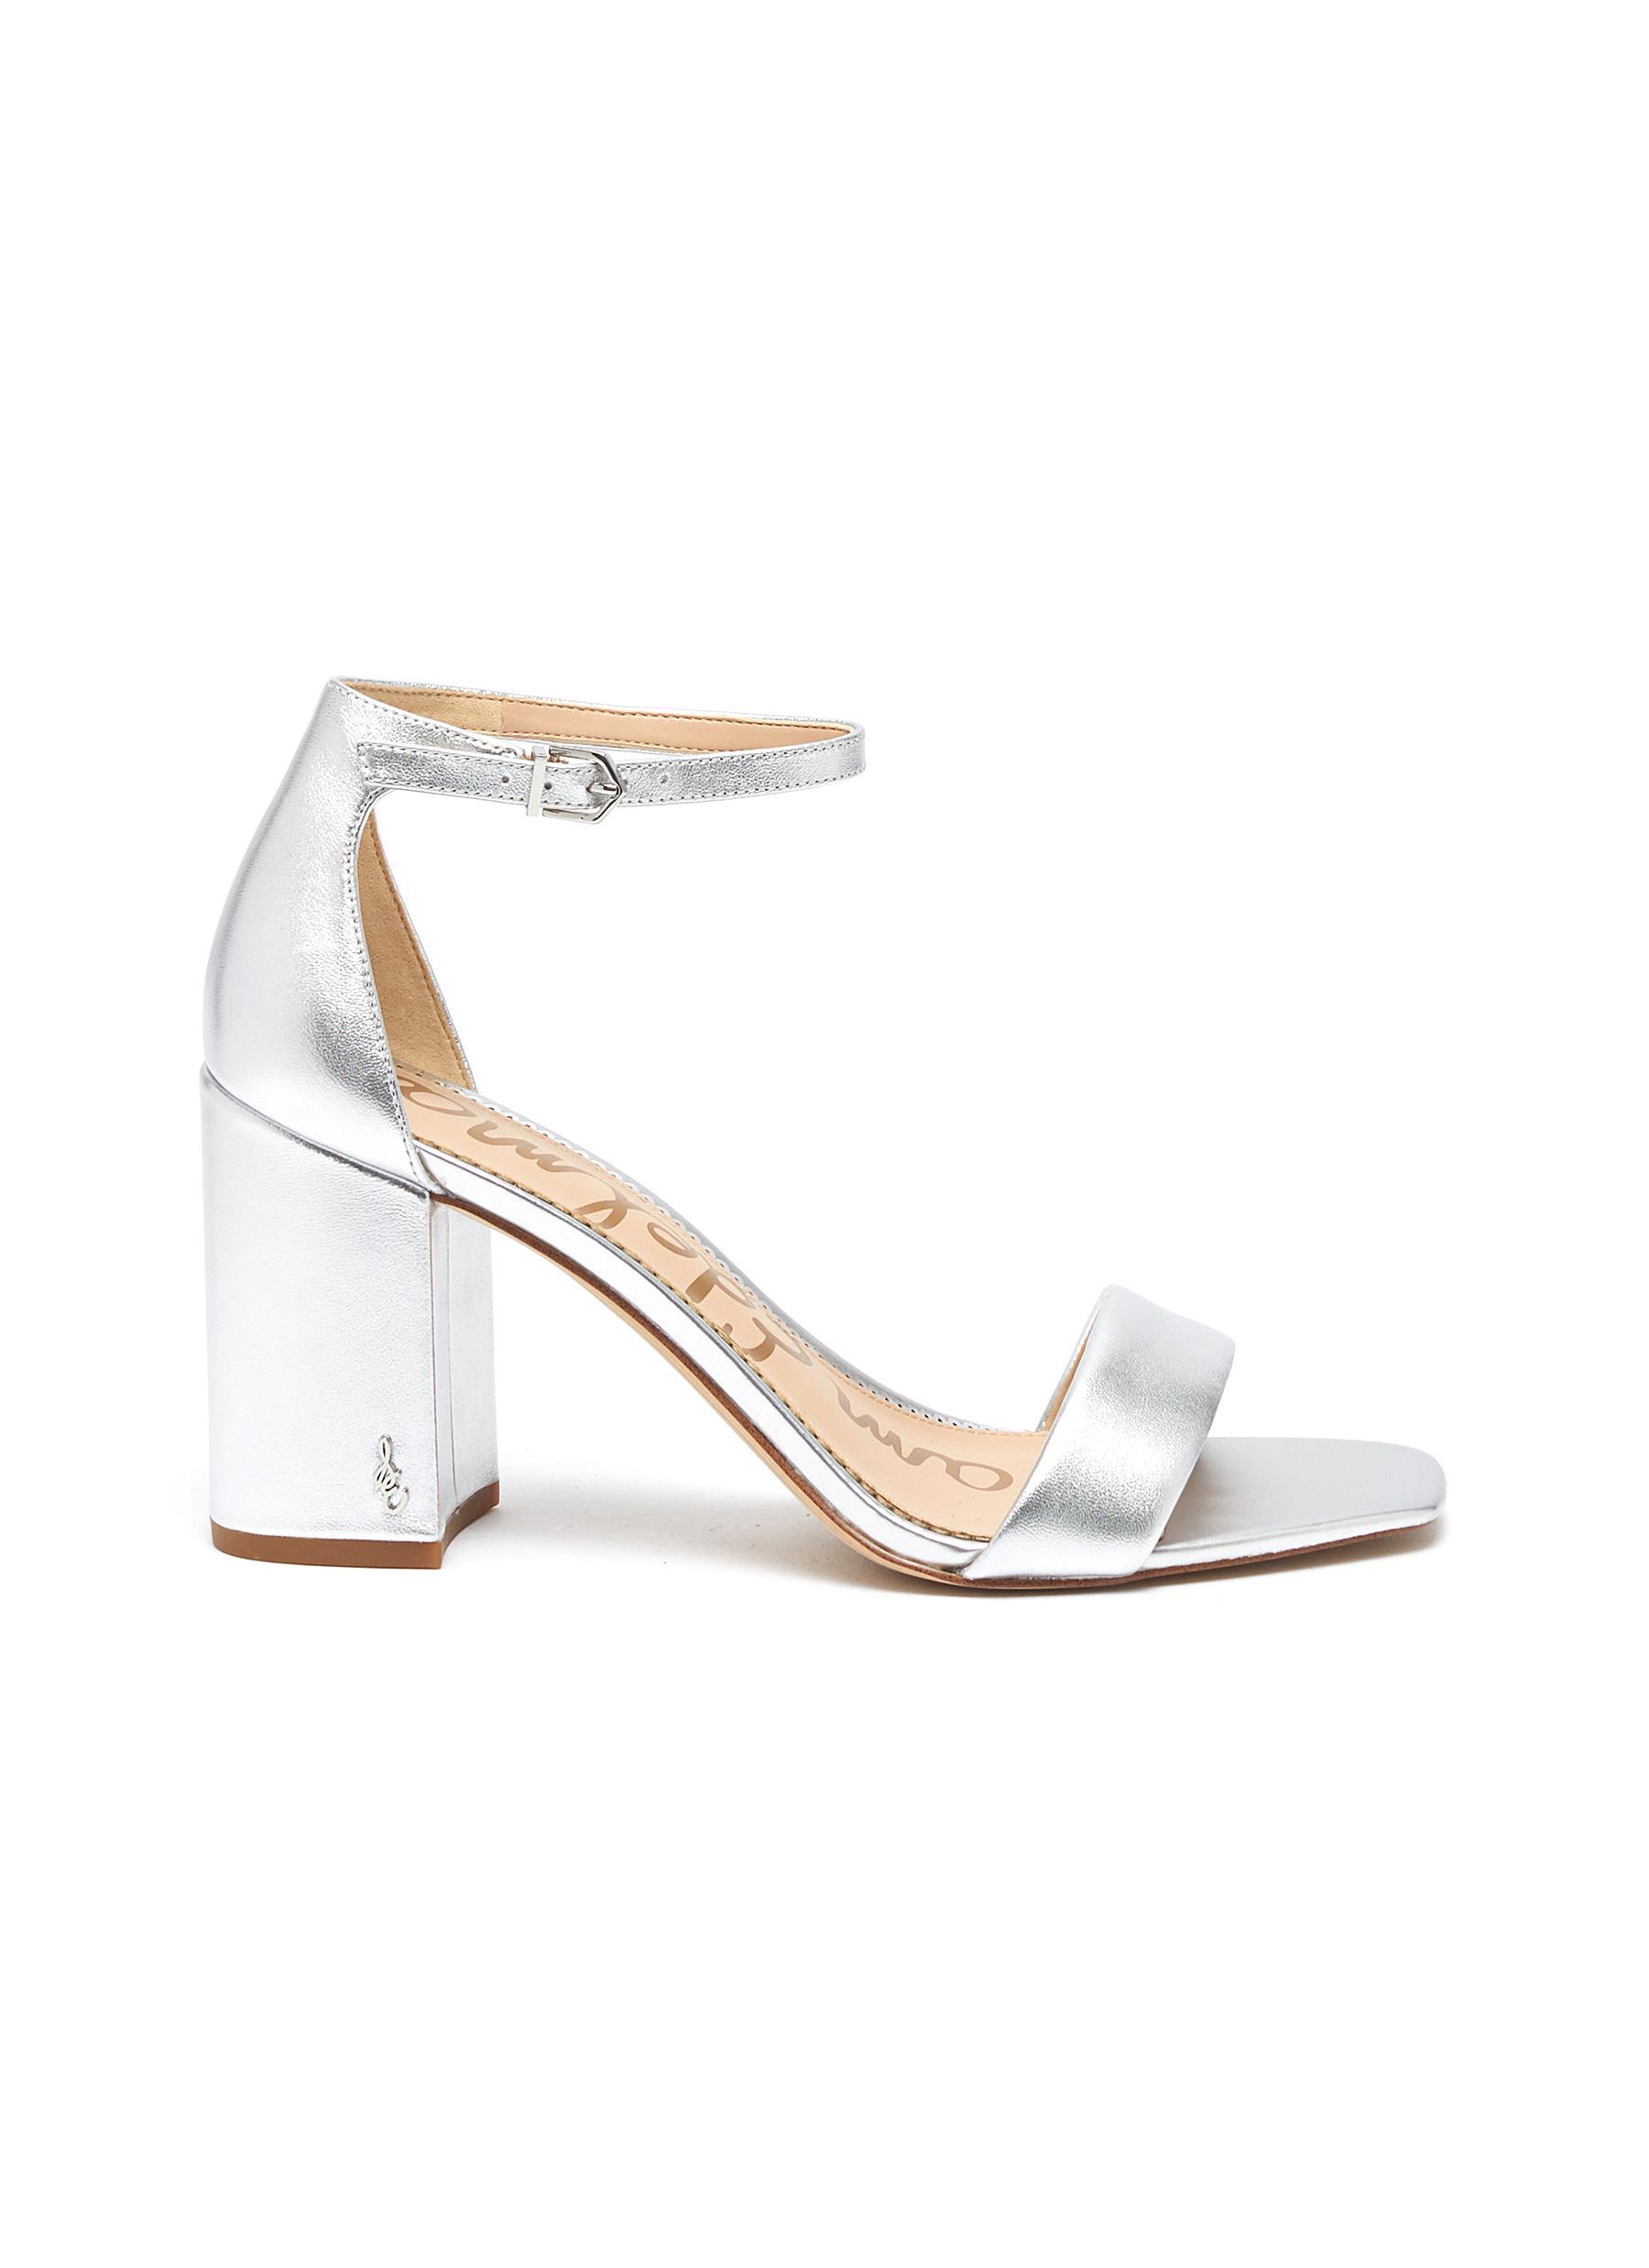 Daniella ankle strap metallic leather sandals by Sam Edelman